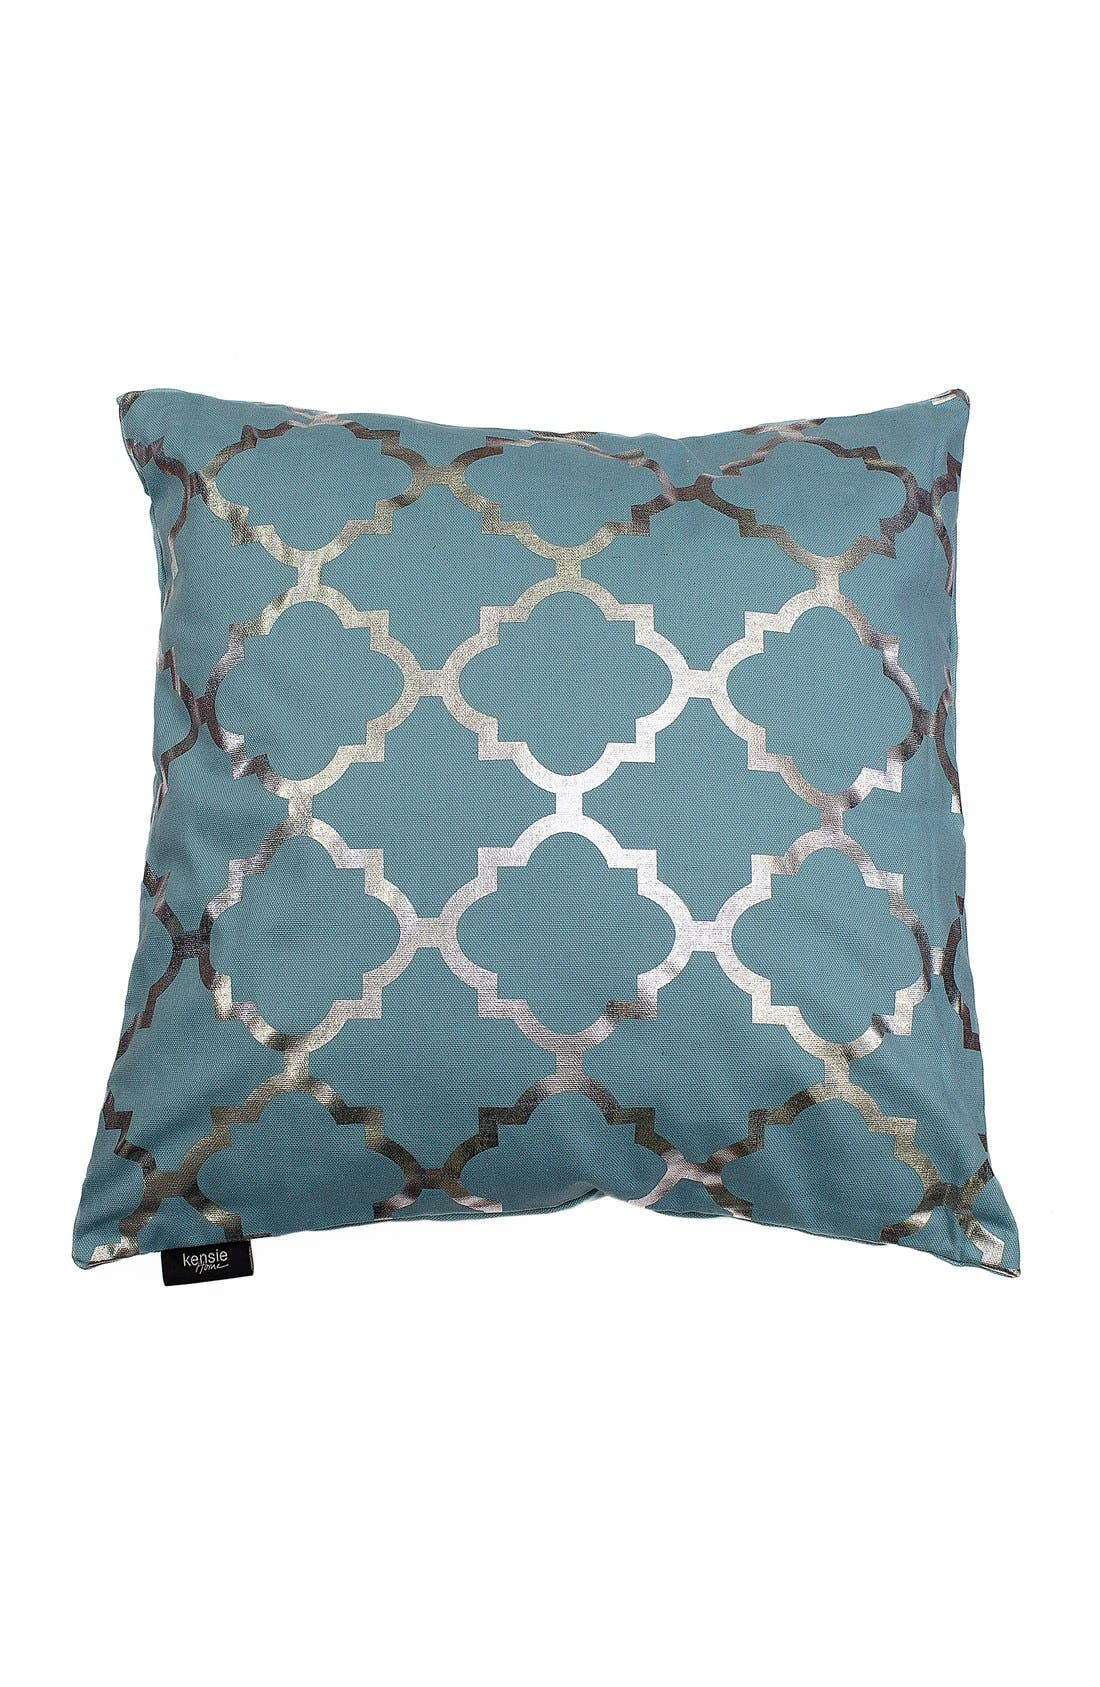 kensie 'Holly' Metallic Lattice Print Pillow